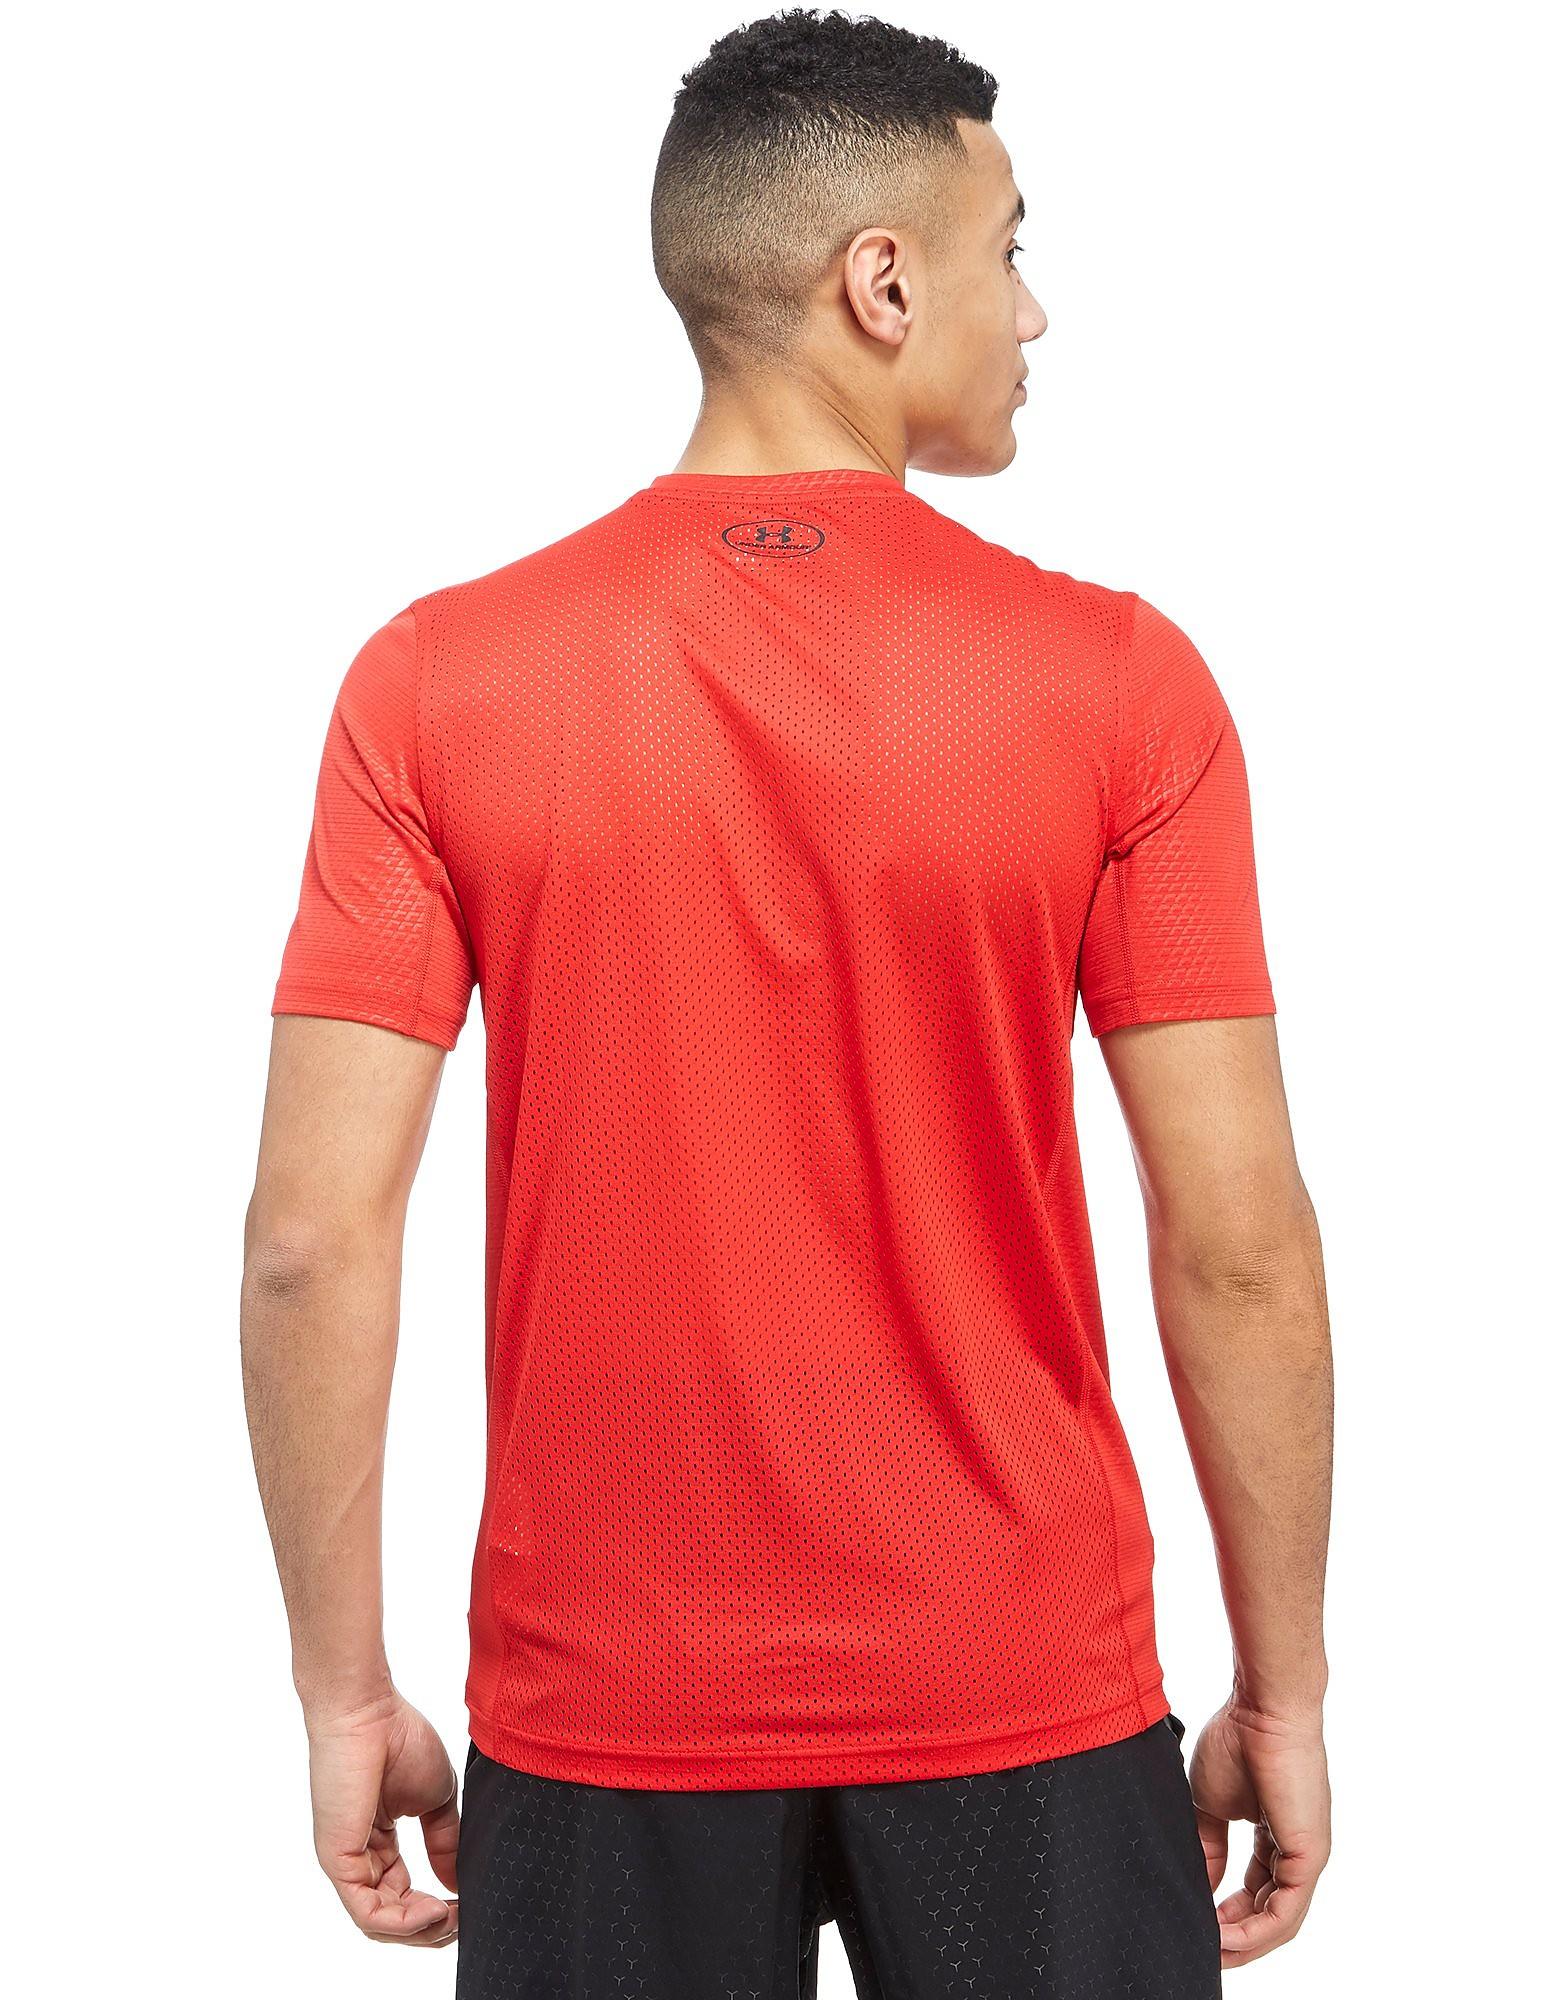 Under Armour Raid Turbo T-Shirt